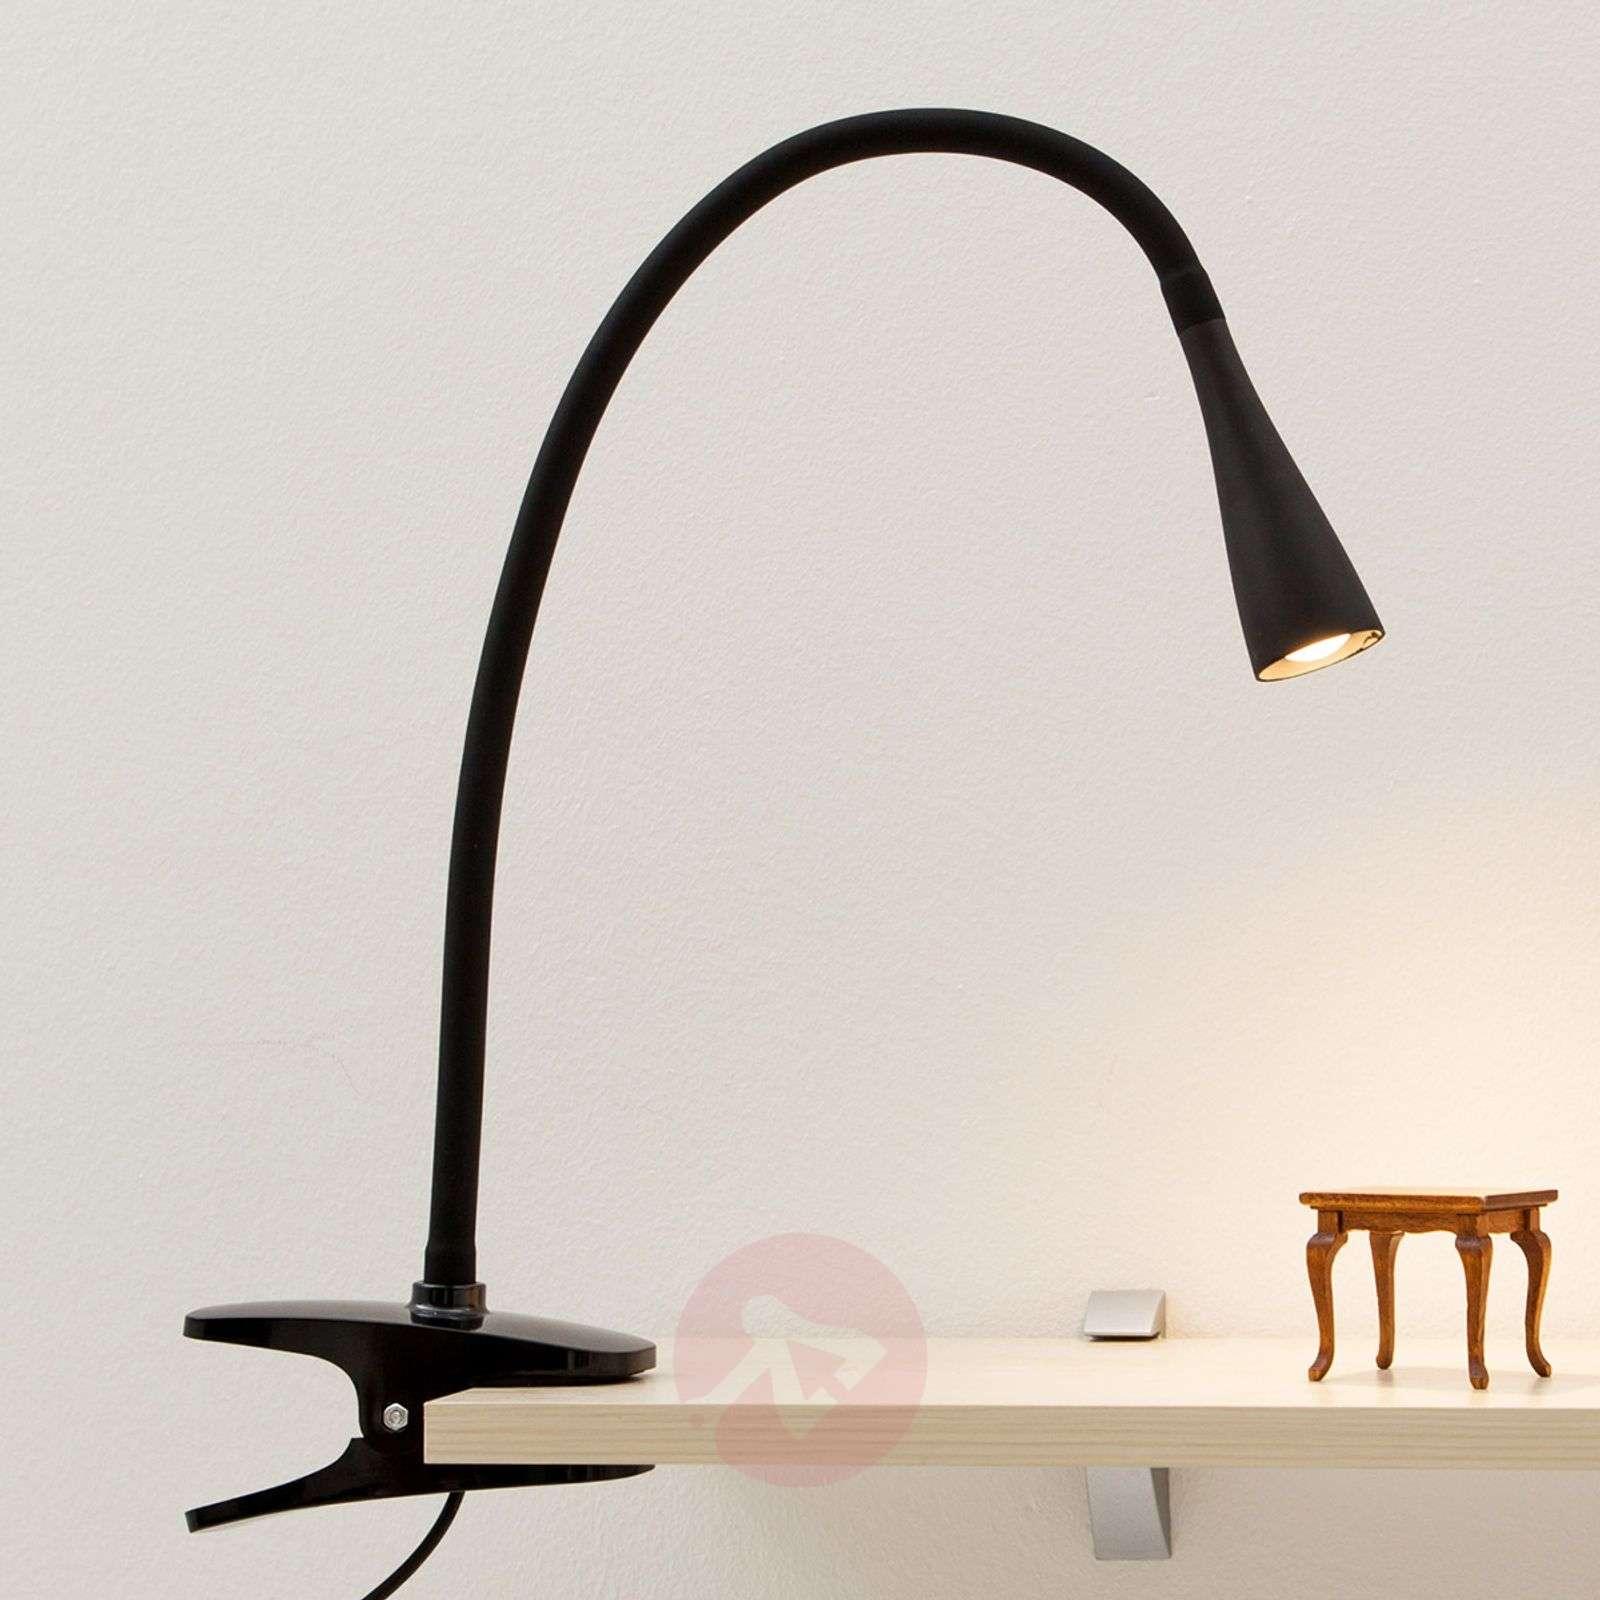 Siro Baris-klipsivalaisin LED musta-9643005-01